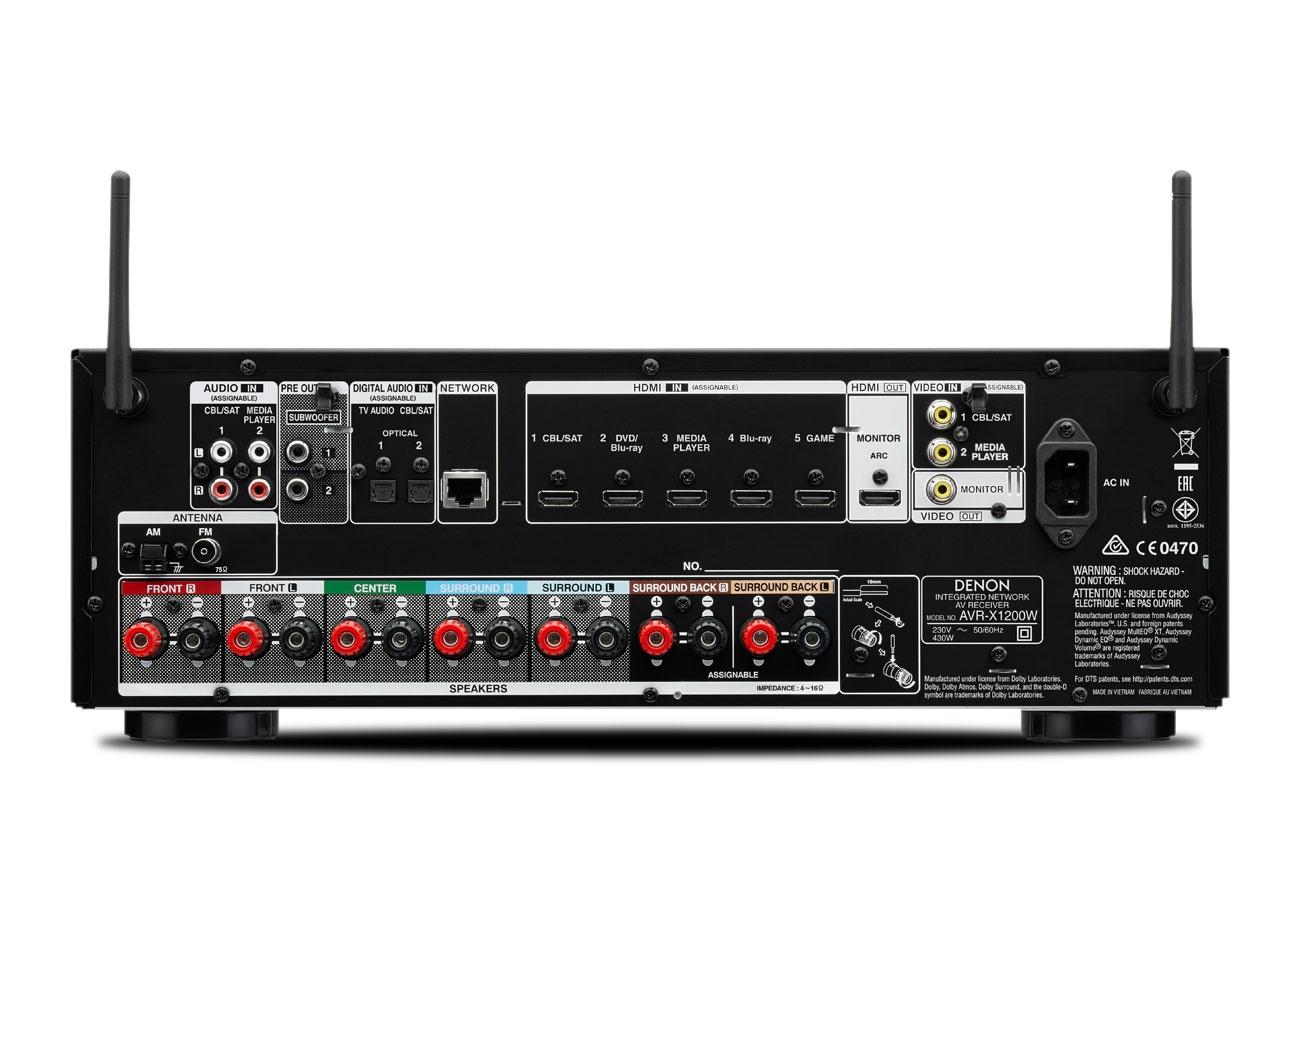 DENON AVR-X1200W ถูกใจ   ใช่เลย